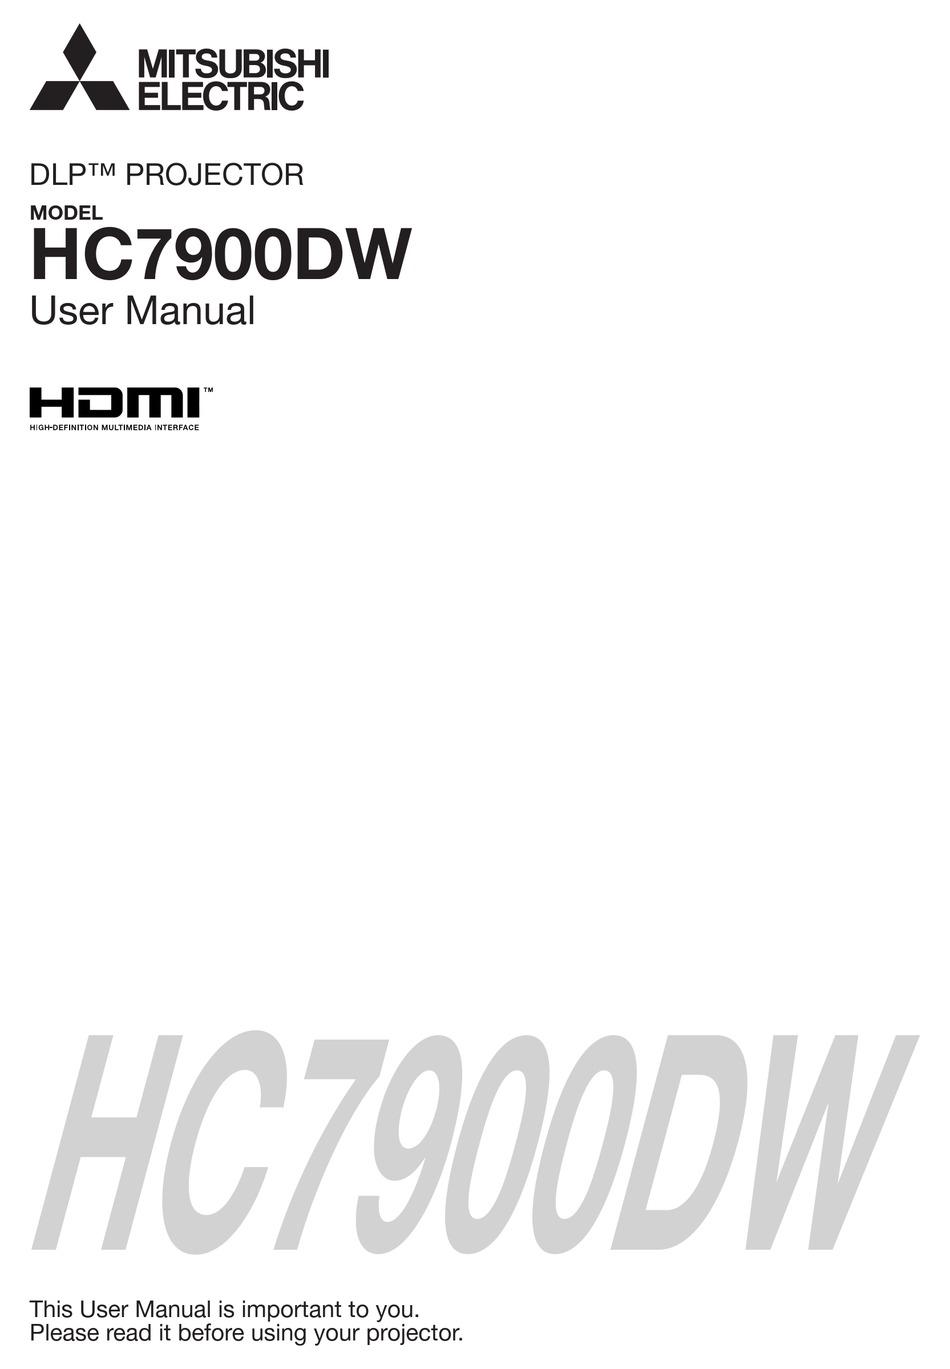 Mitsubishi Electric Dlp Hc7900dw User Manual Pdf Download Manualslib